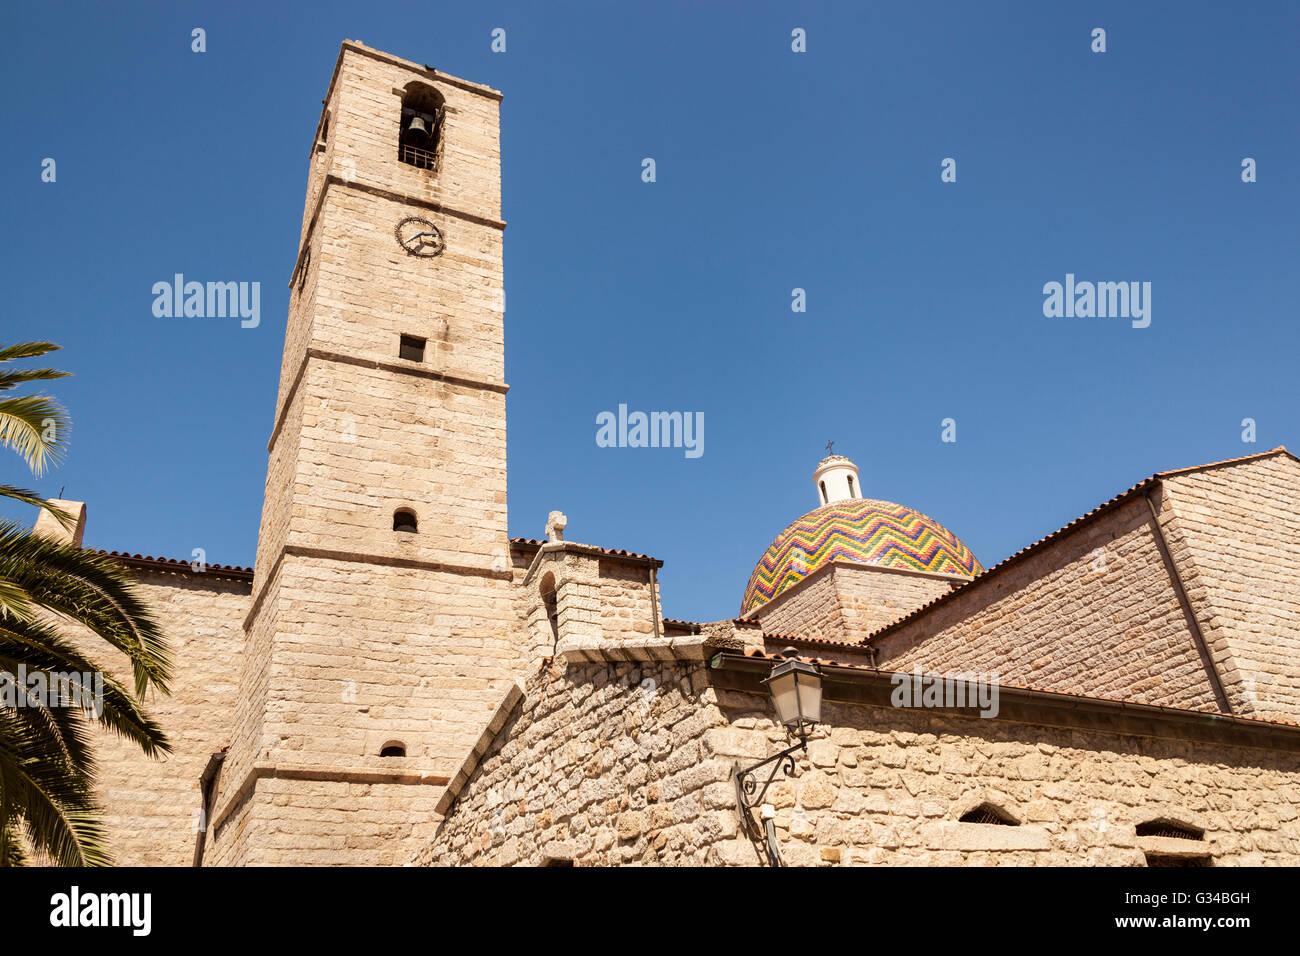 Chiesa Di San Paolo, Saint Paul's Church, Olbia, Sardinia, Italy - Stock Image